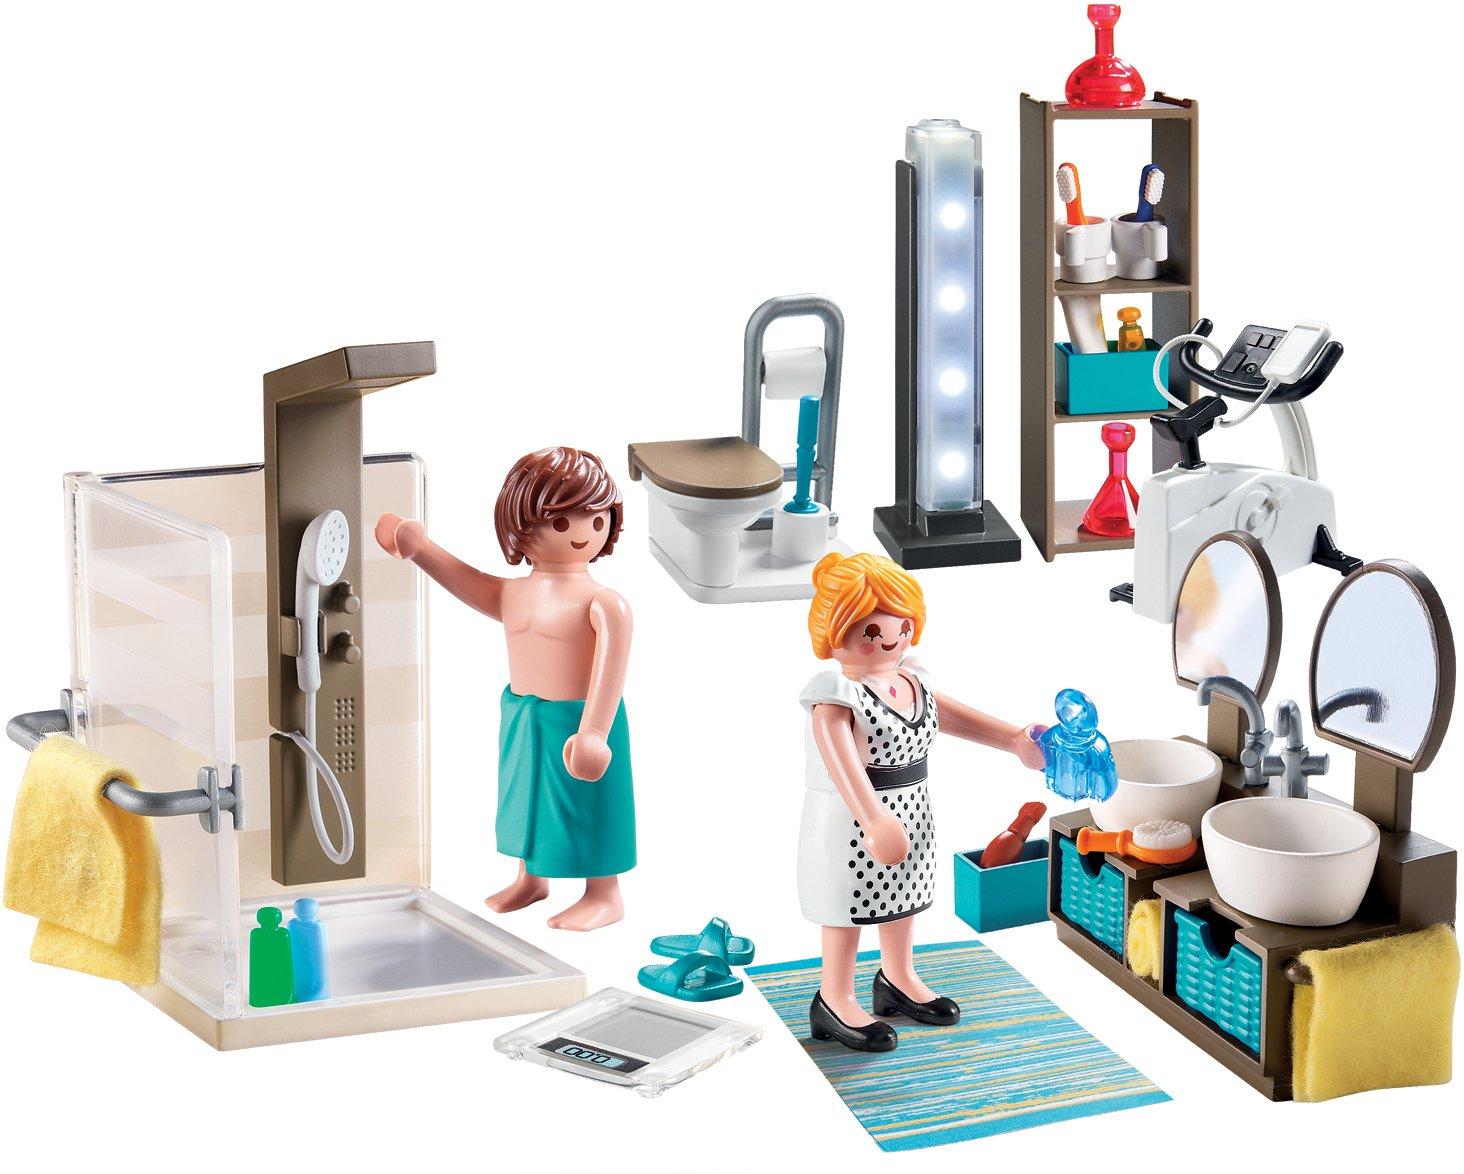 Playmobil 9268 City Life - Bathroom: Amazon.co.uk: Toys & Games